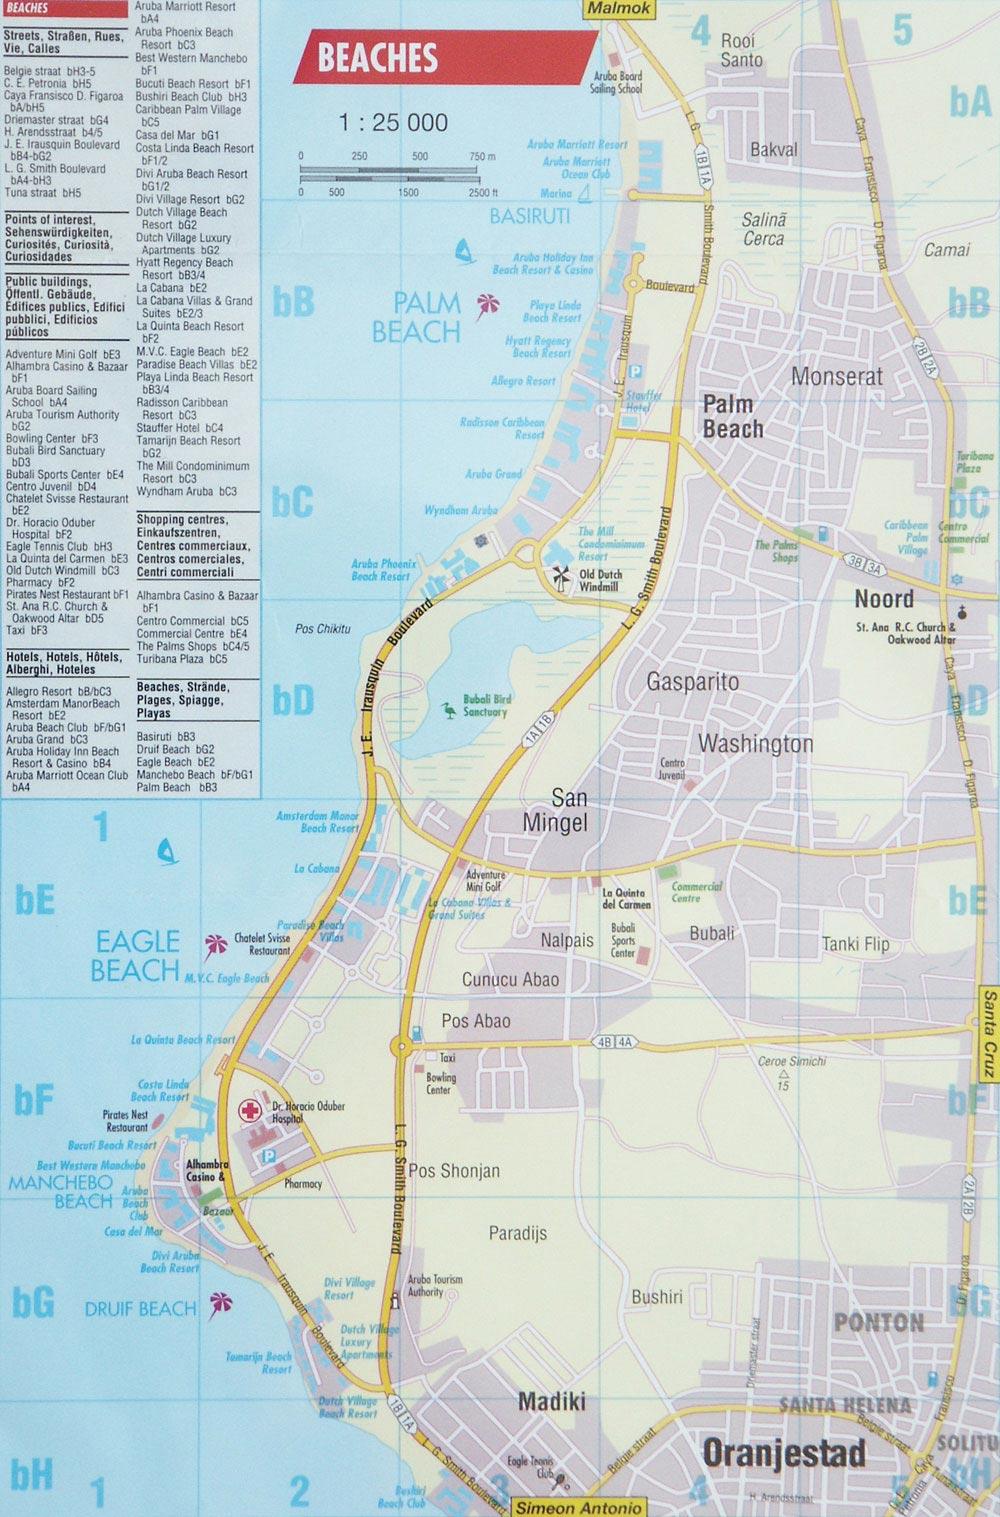 arubabeachmap